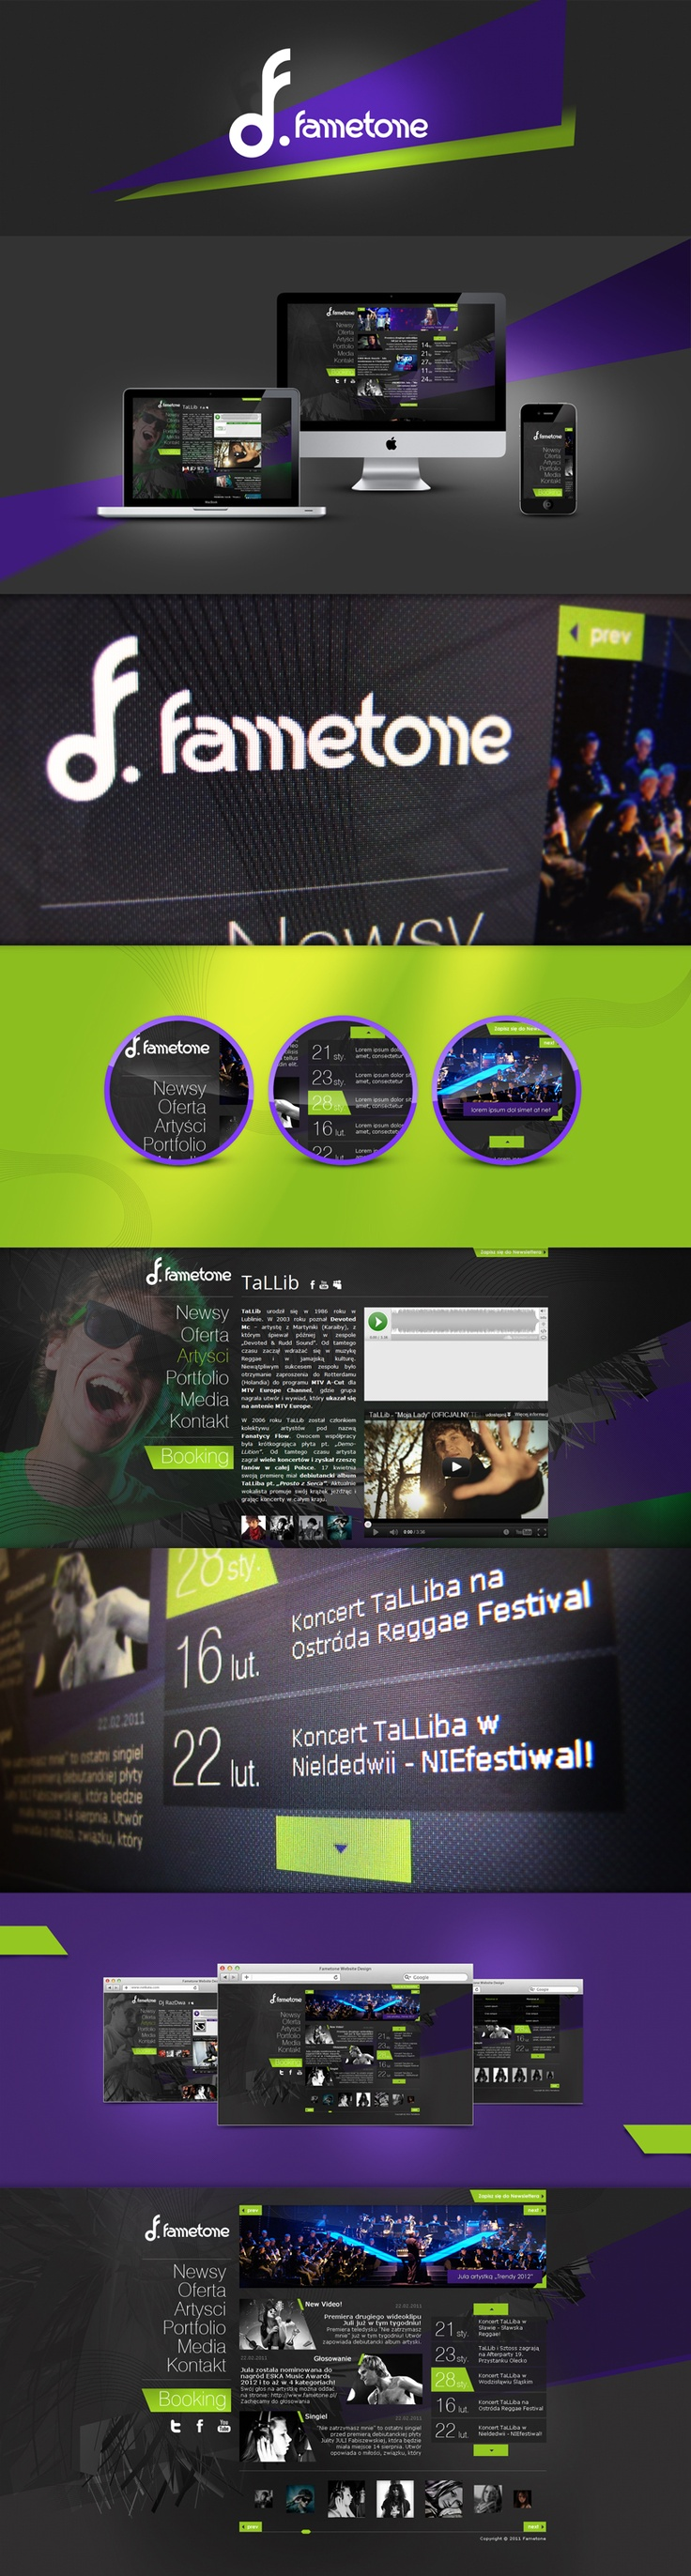 http://netkata.com/#/fametone